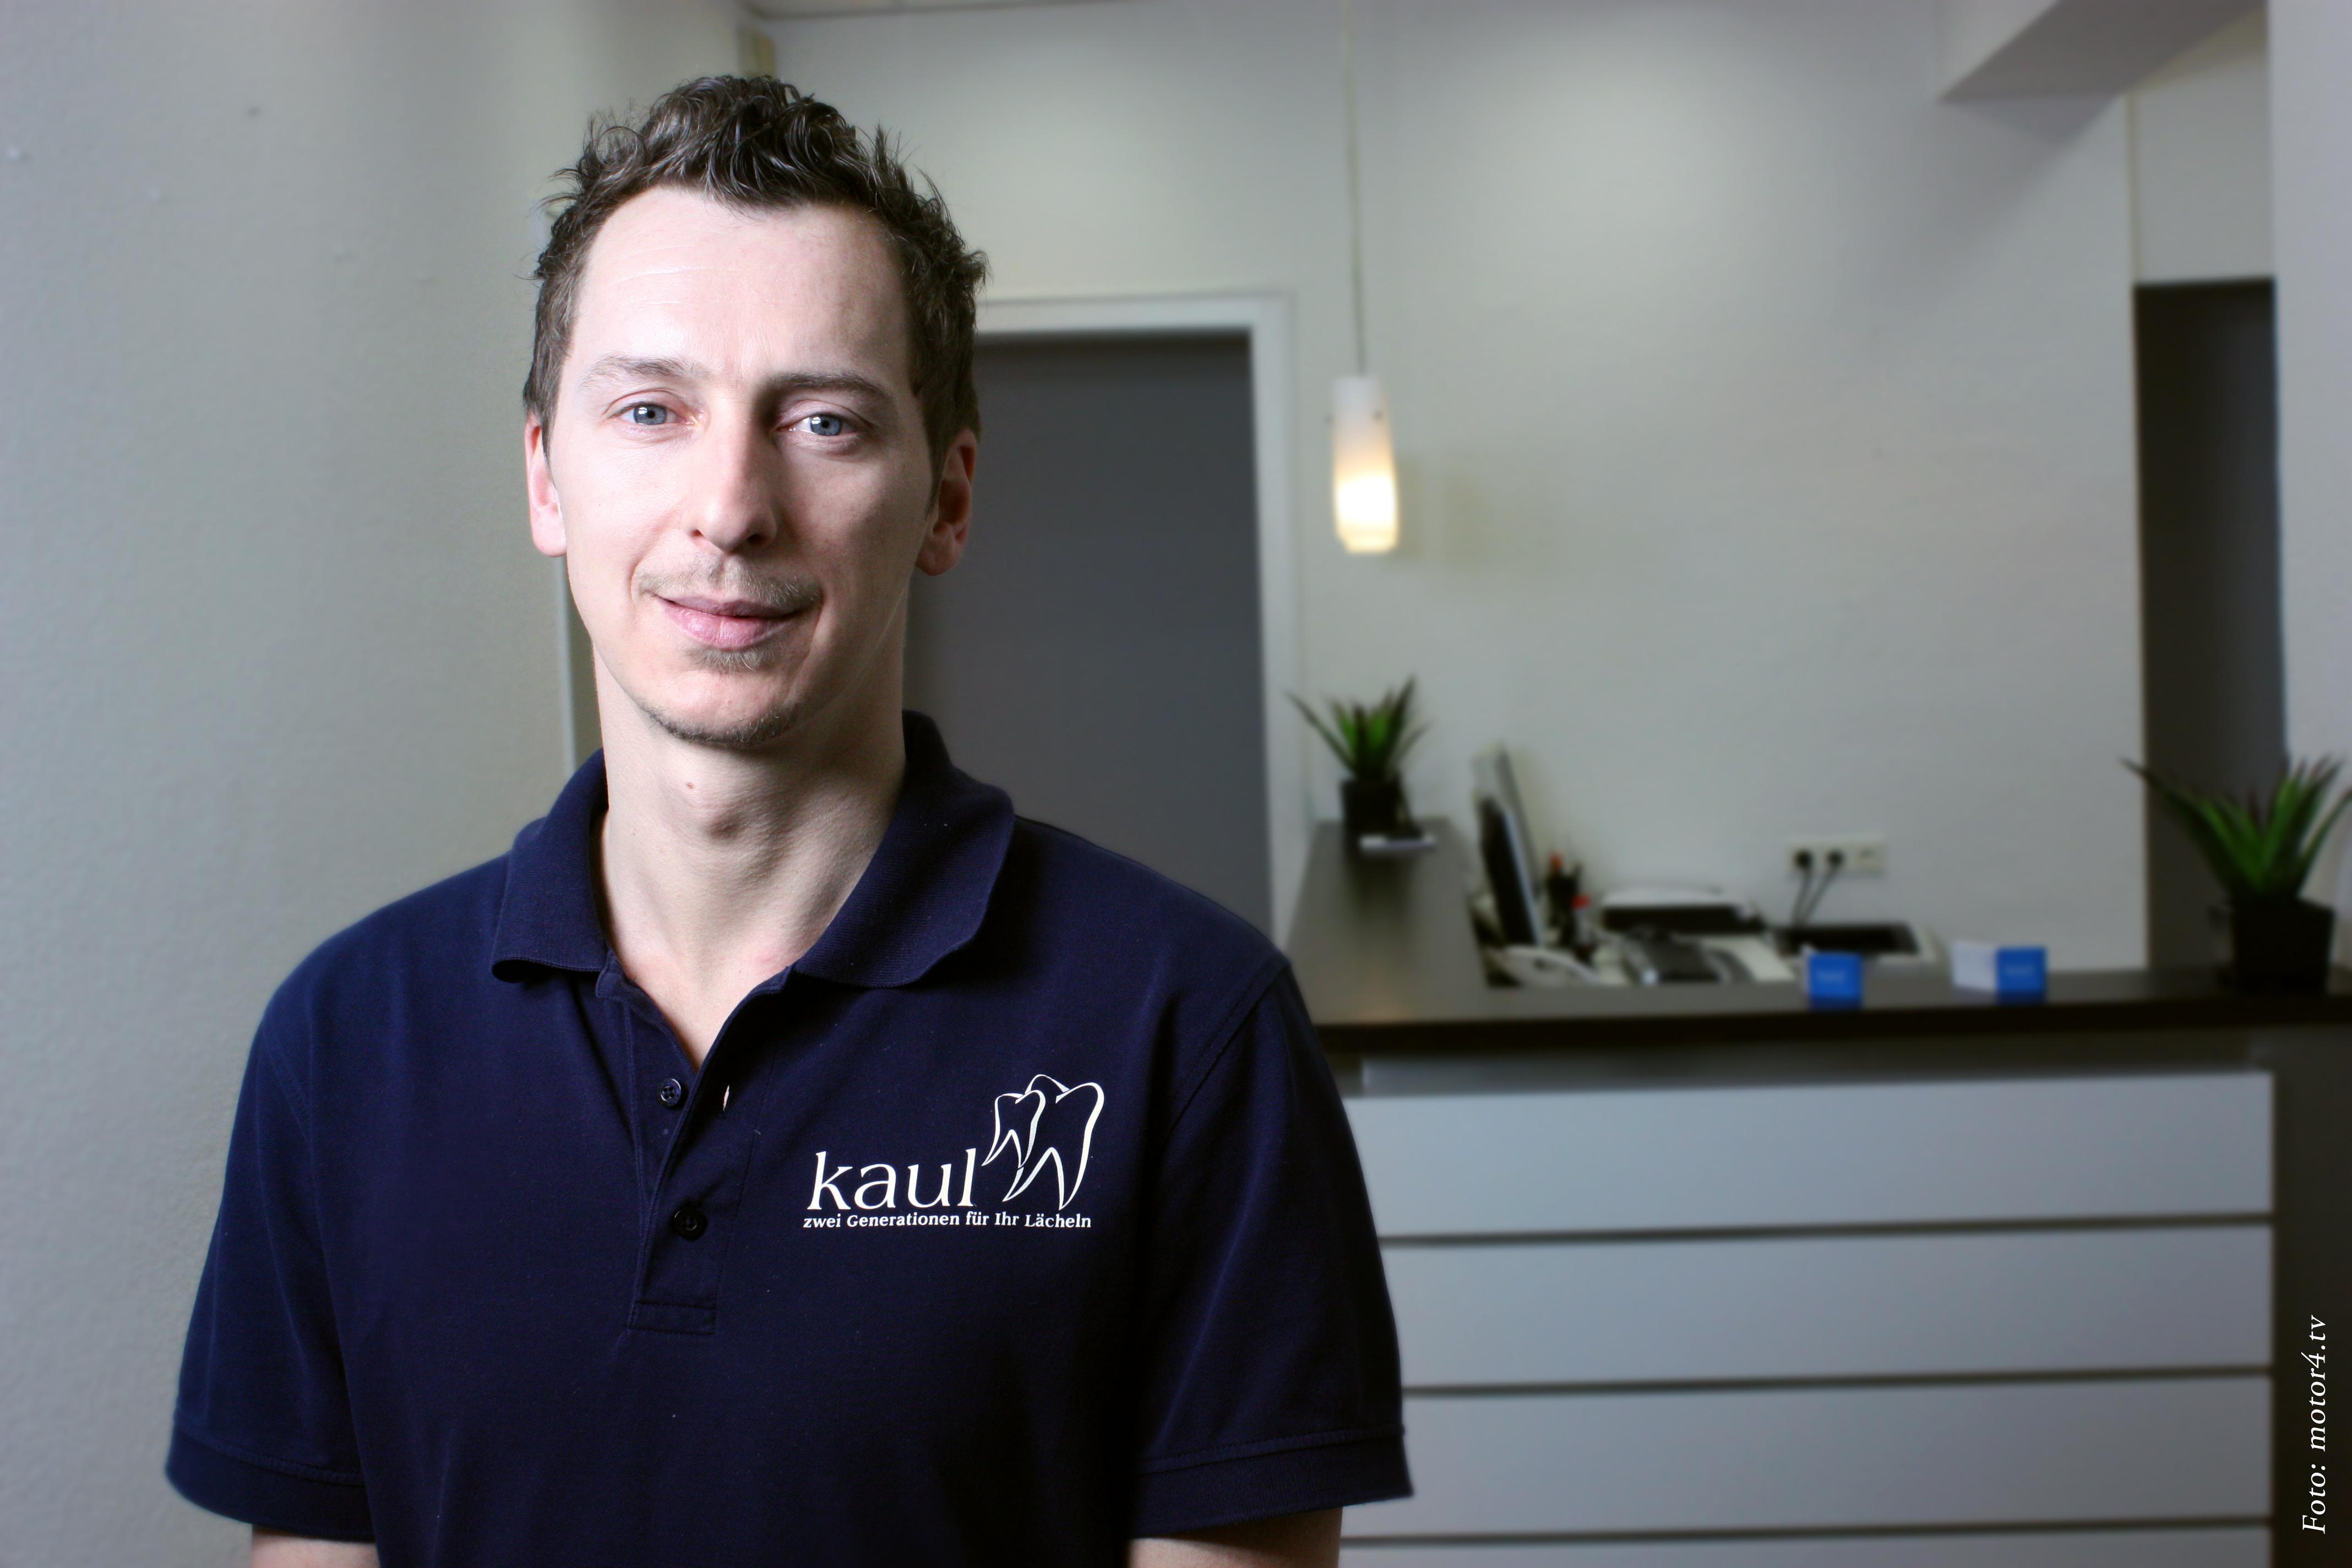 Sebastian Kaul